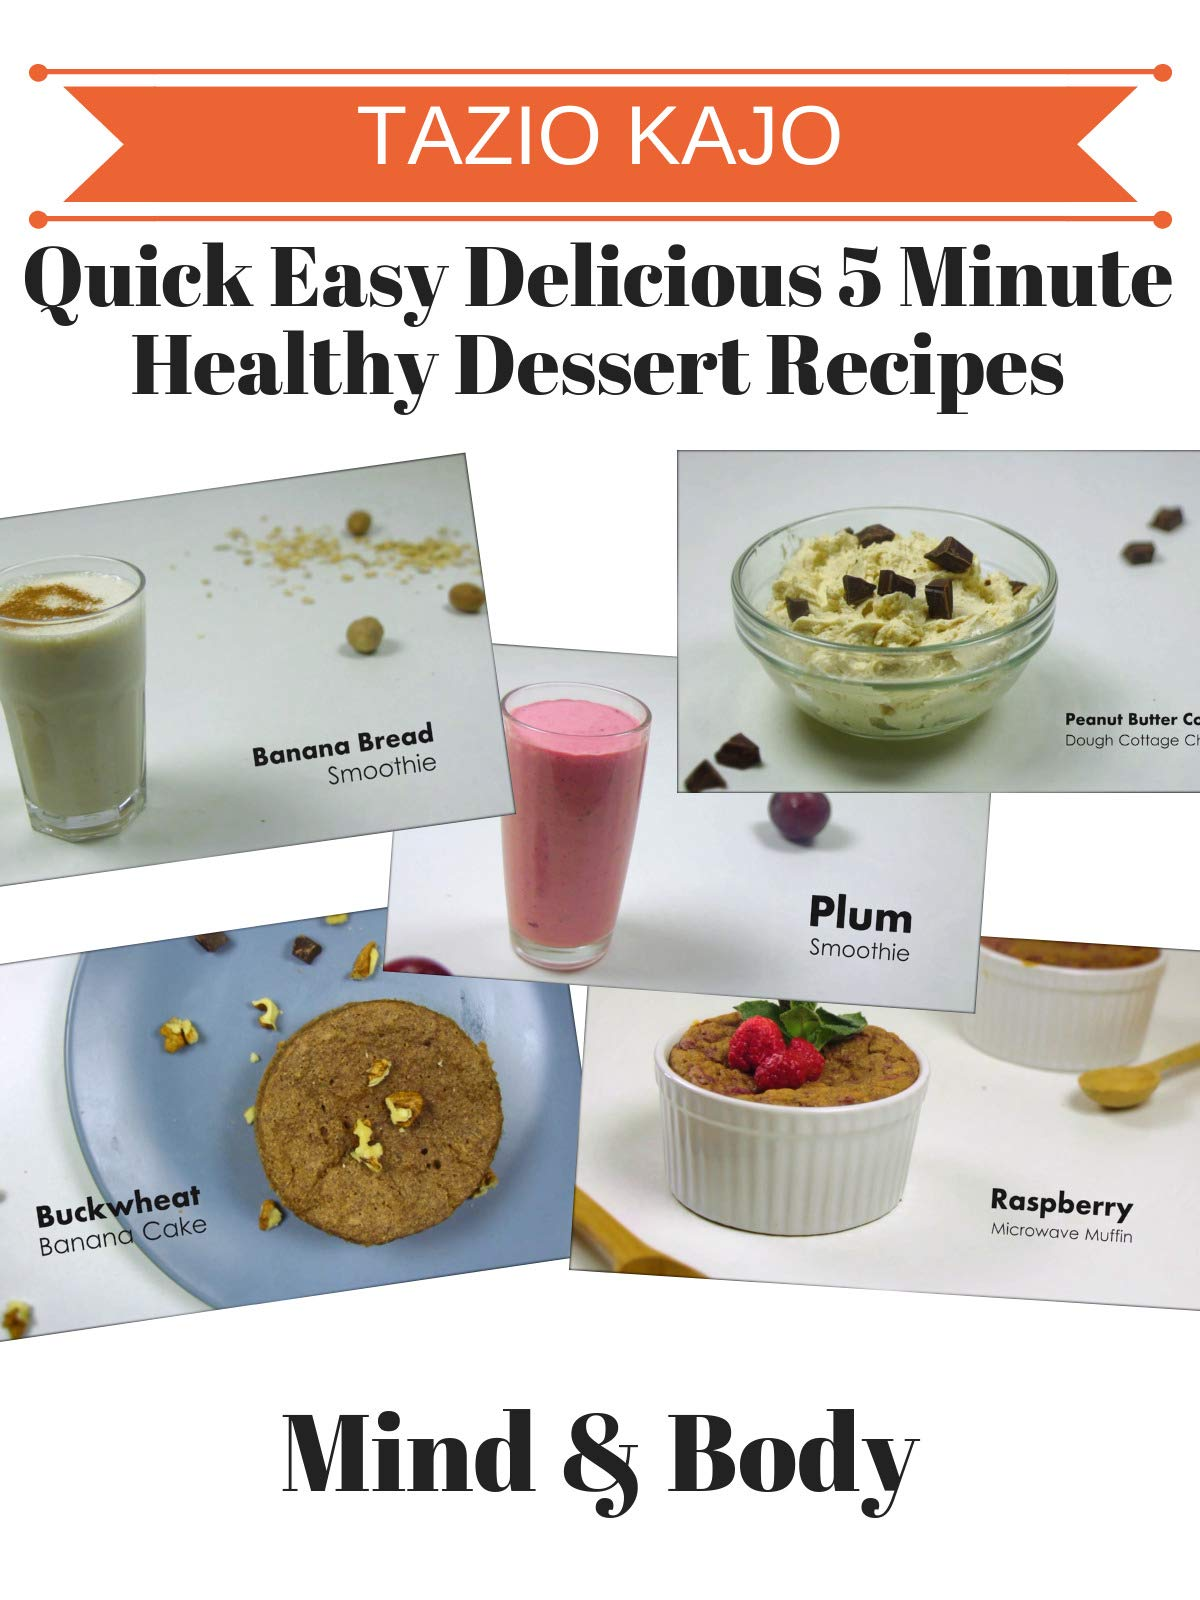 Quick Easy & Delicious 5 Minute Healthy Dessert Recipes